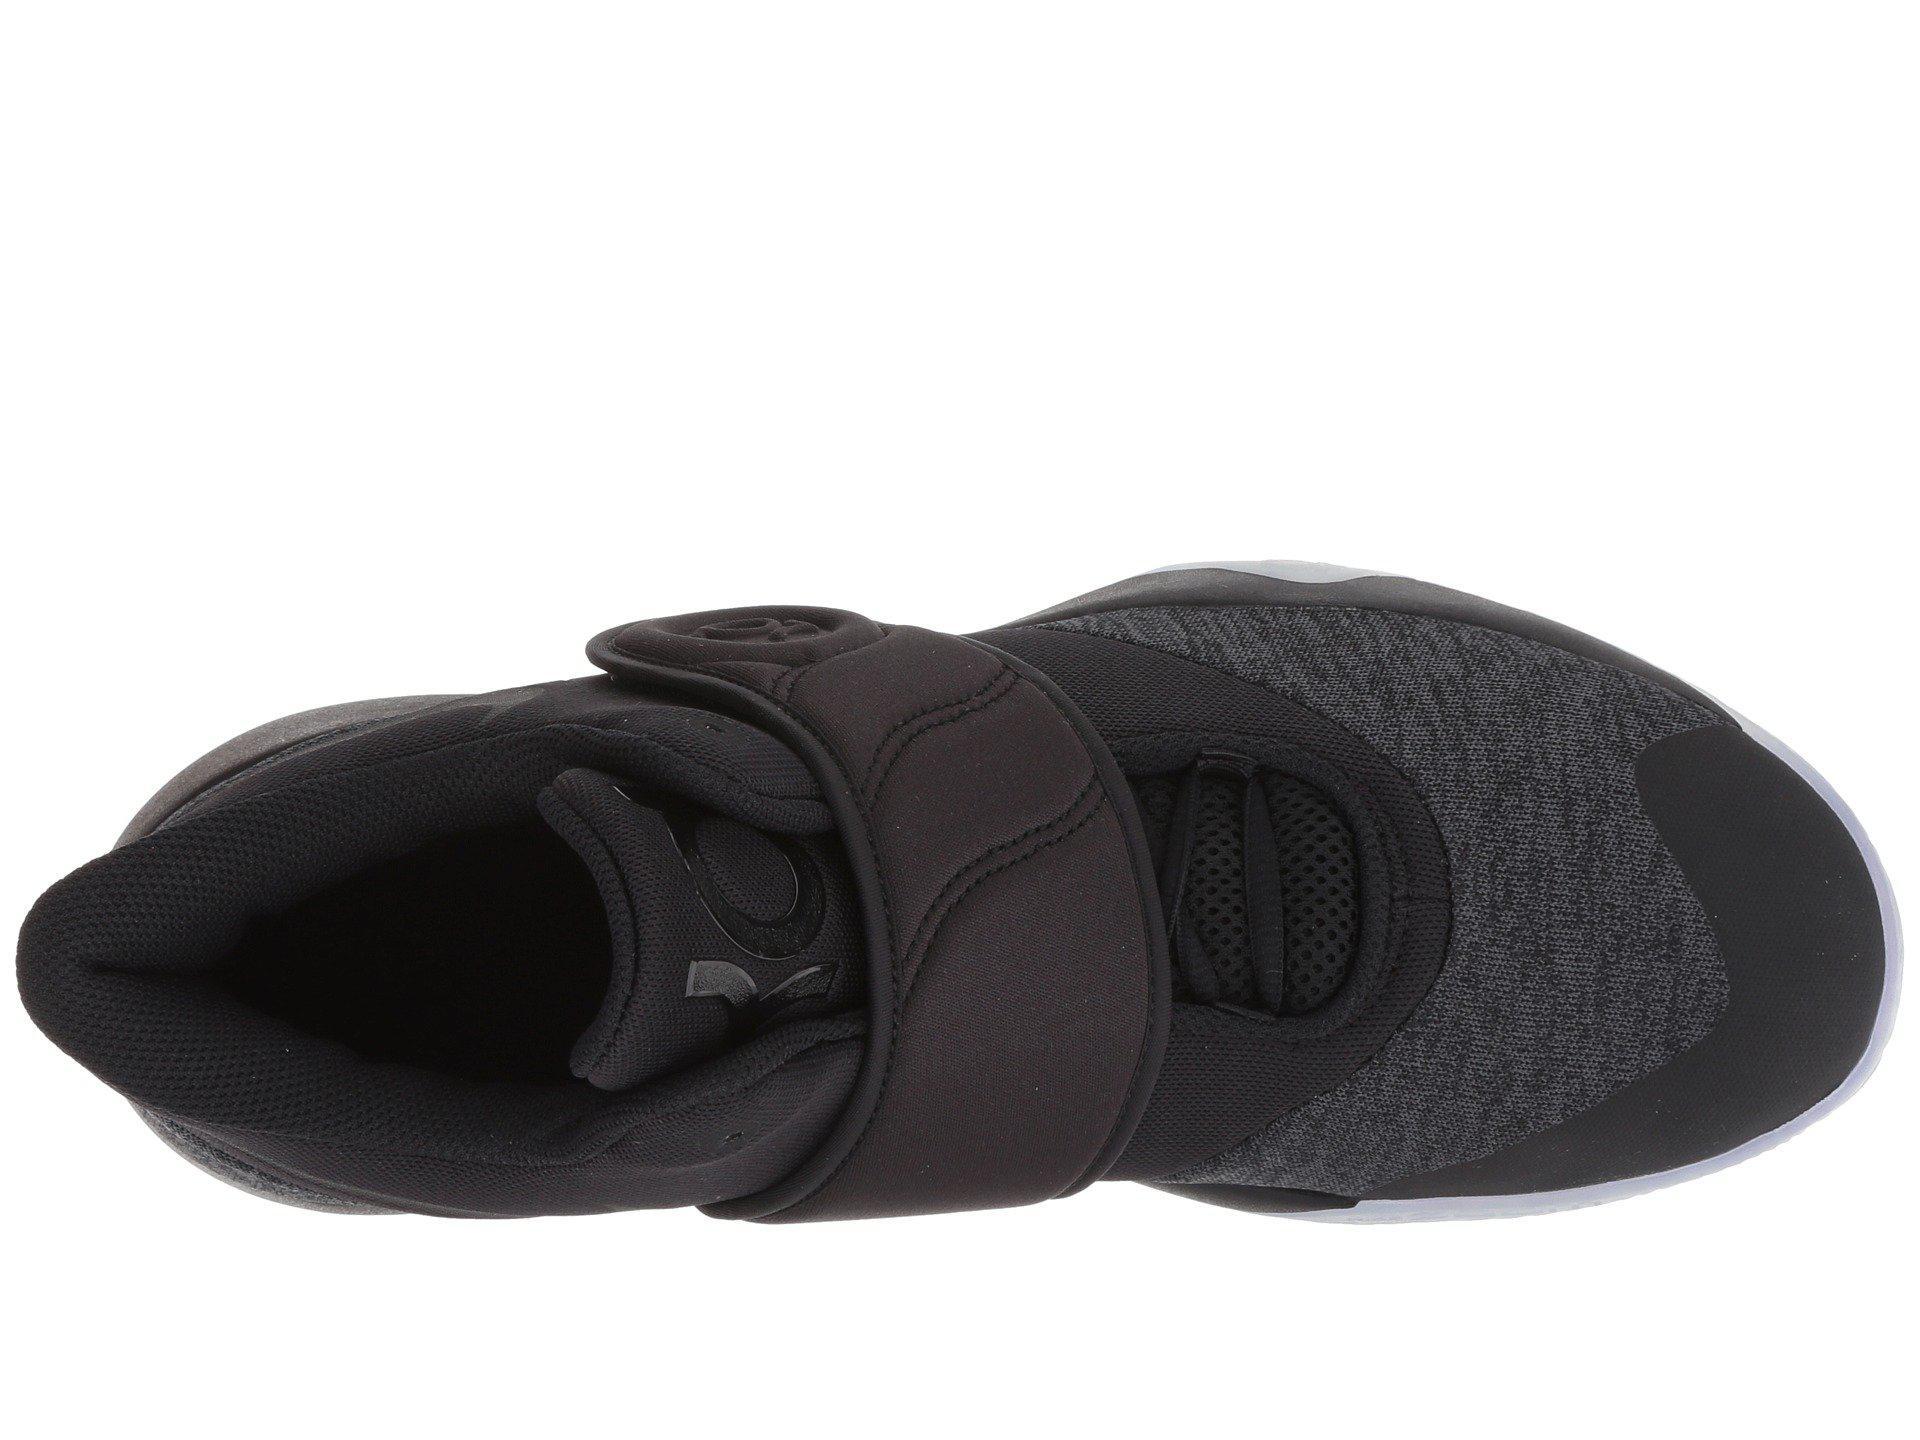 07bd678b453c Nike - Kd Trey 5 Vi (black black dark Grey clear). View fullscreen